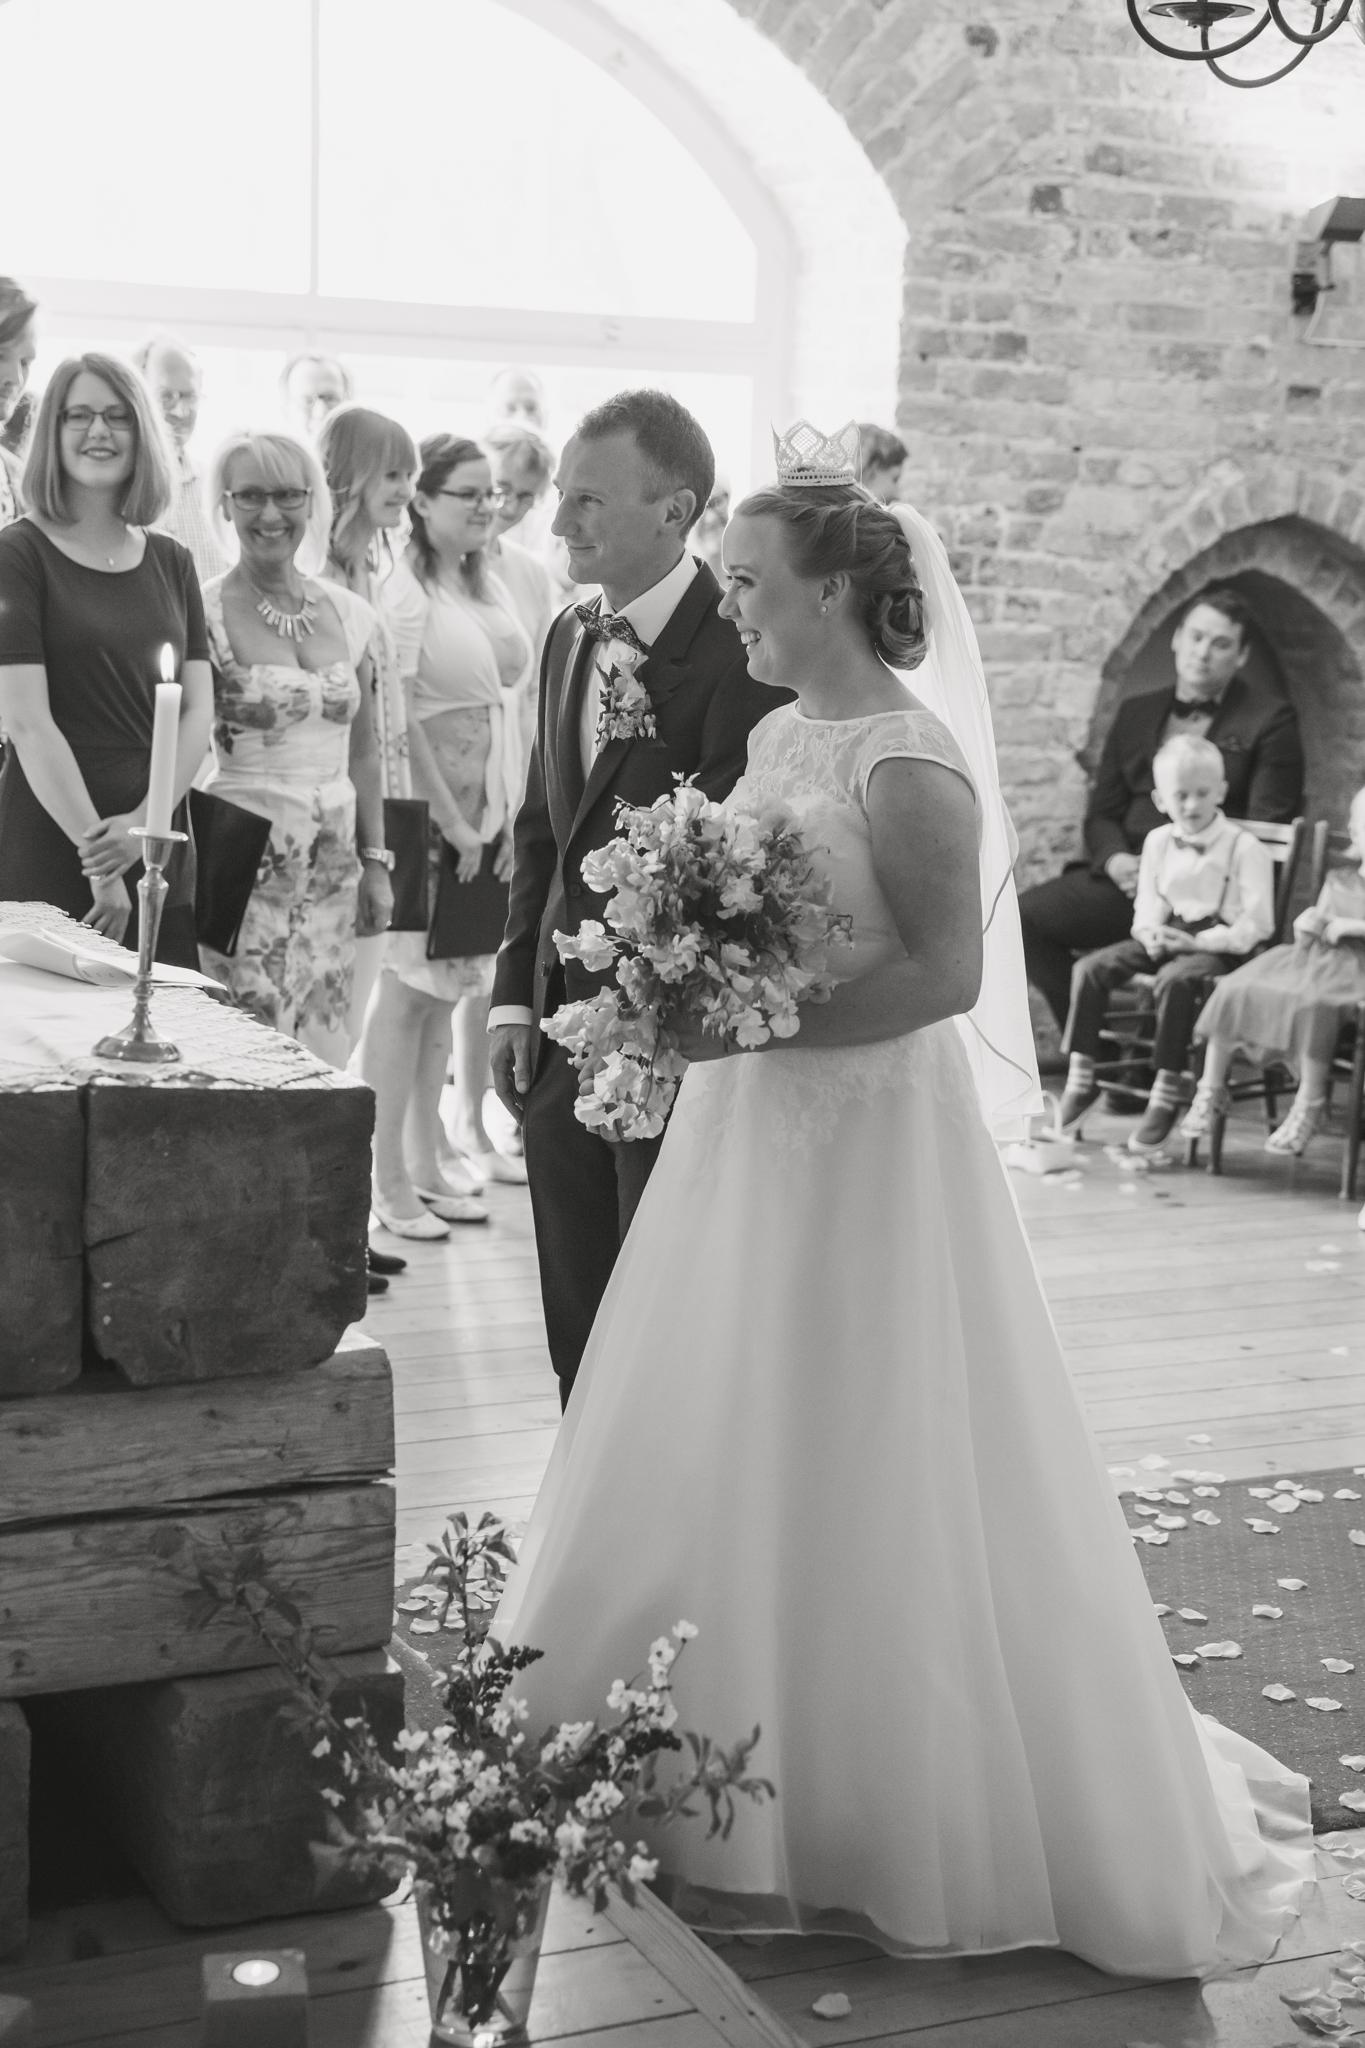 ViOli Photography bröllopsfotograf-Karlshamn-Blekinge-Ronneby-Karlskrona-Sölvesborg-Bromölla-Kristianstad (26 av 35)